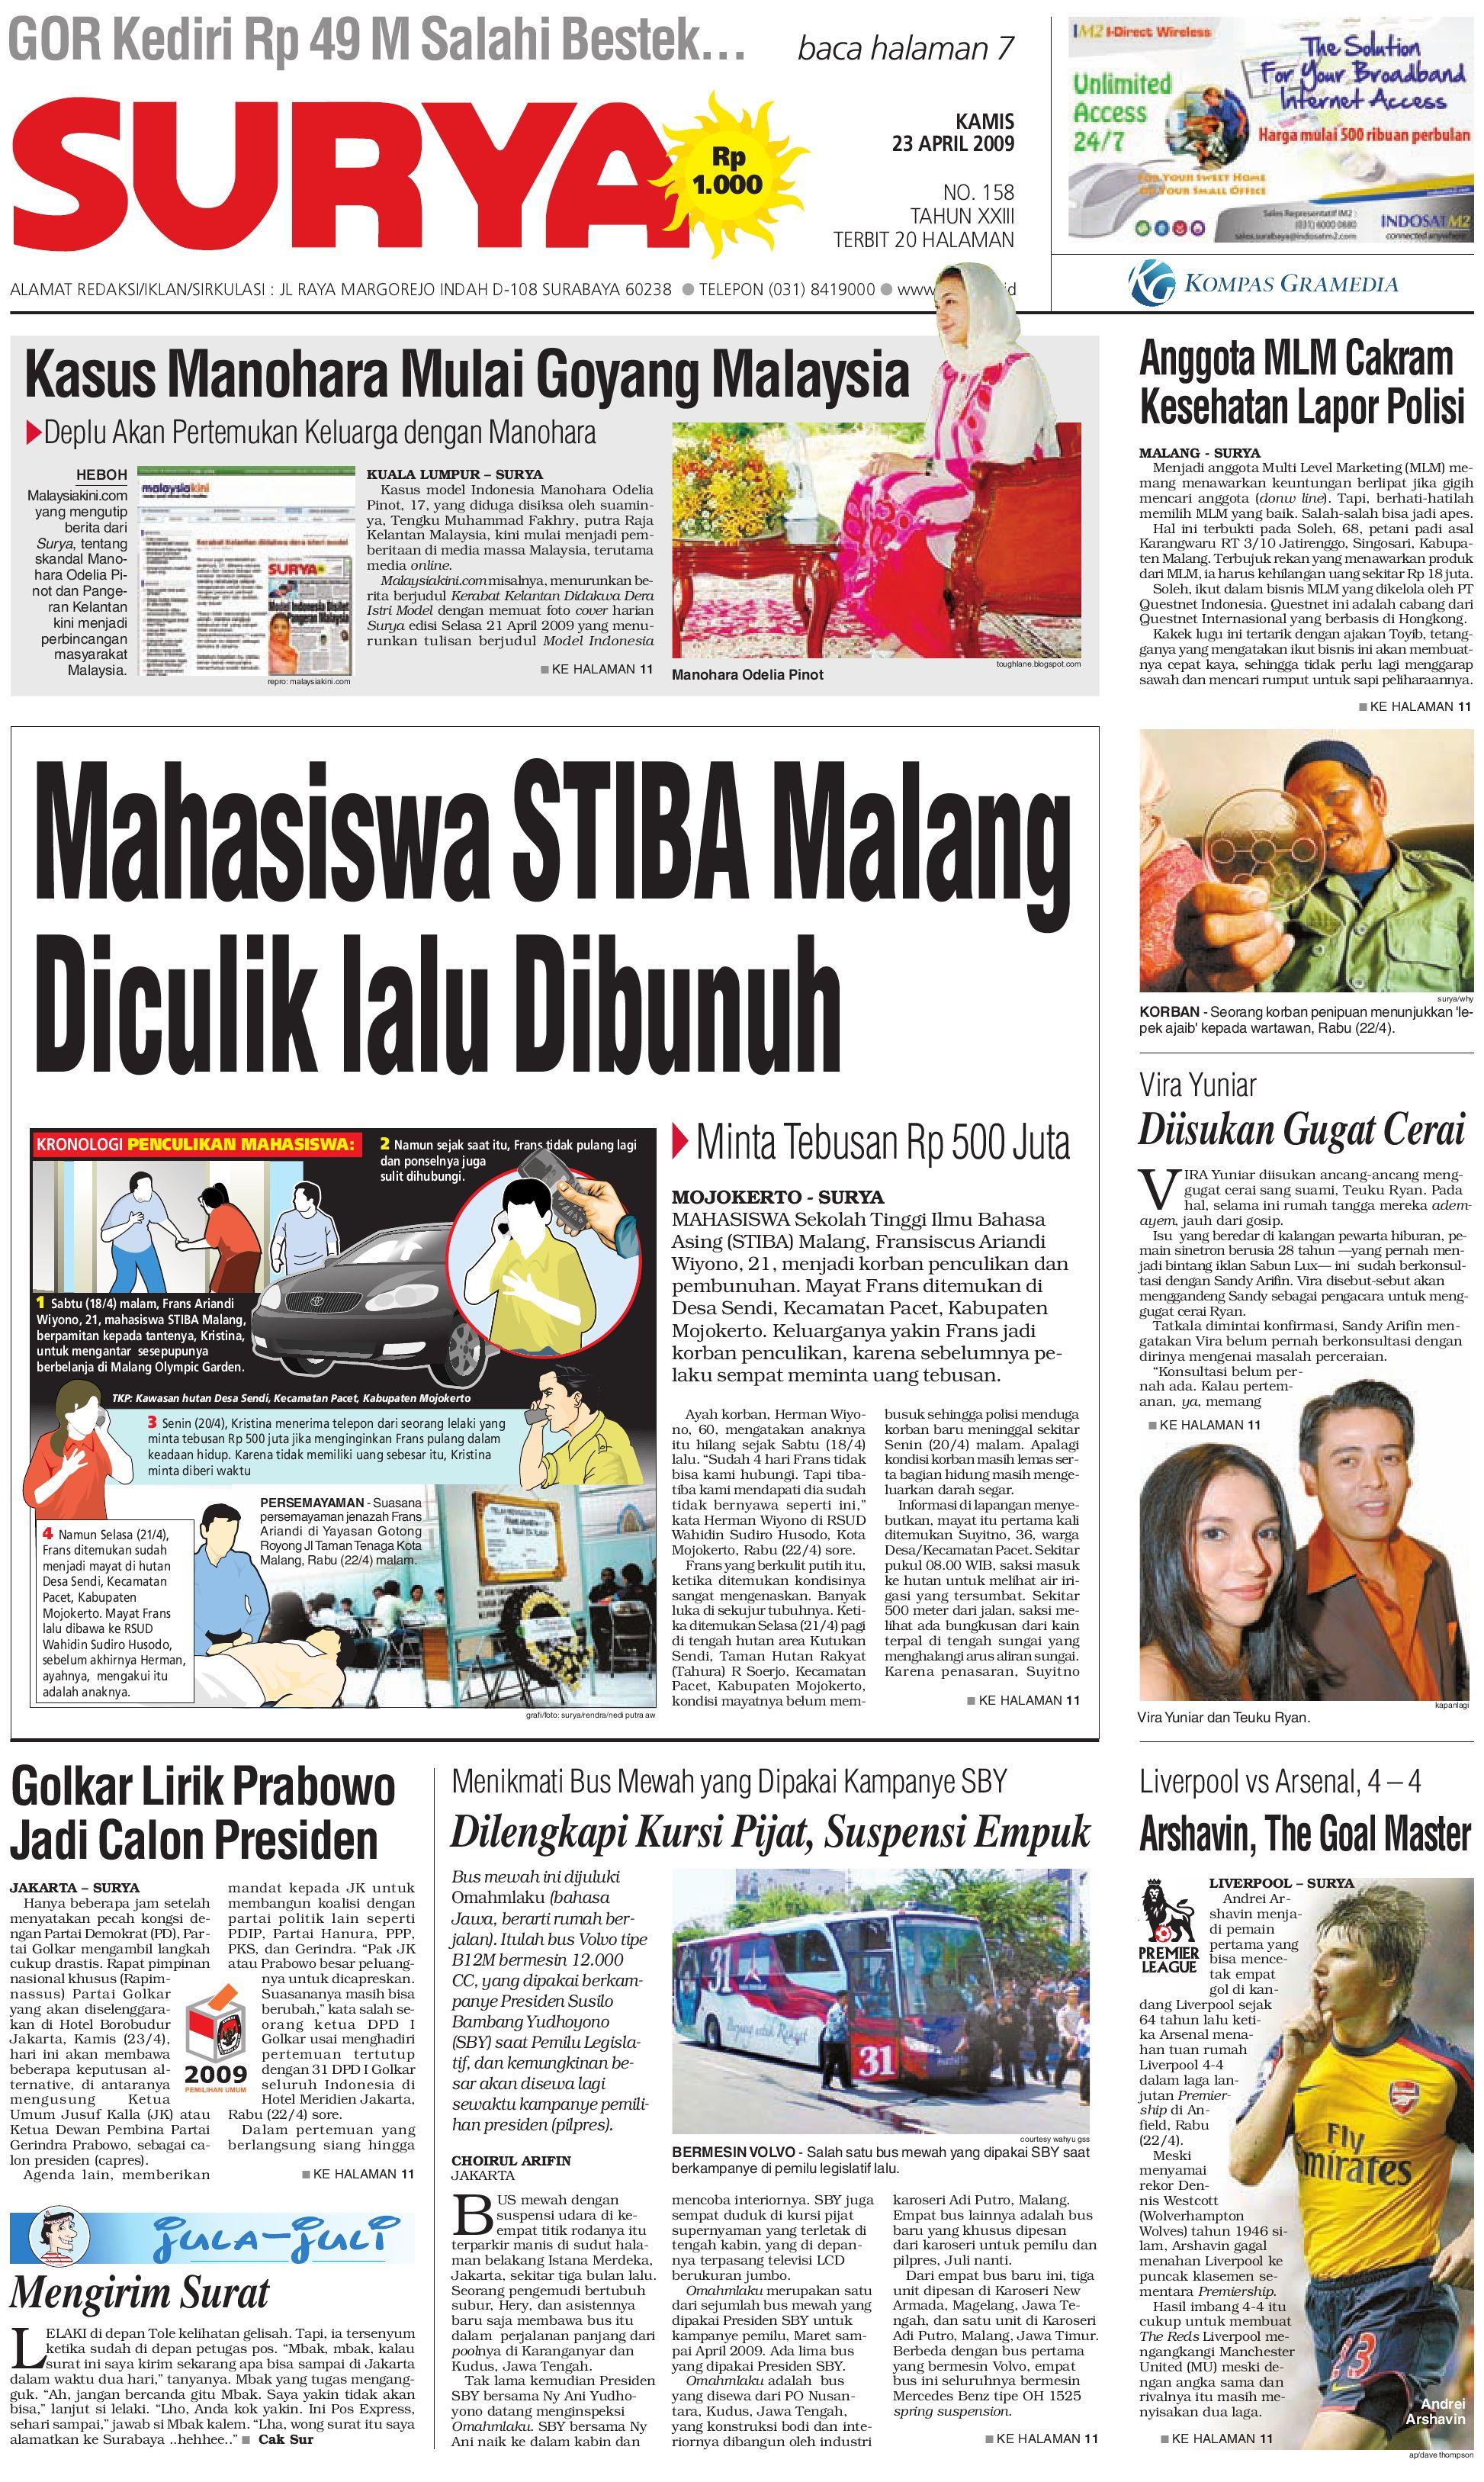 Surya Edisi Cetak 23 April 2009 By Harian Issuu Jam Tangan Qampampq A170 Original Bergaransi